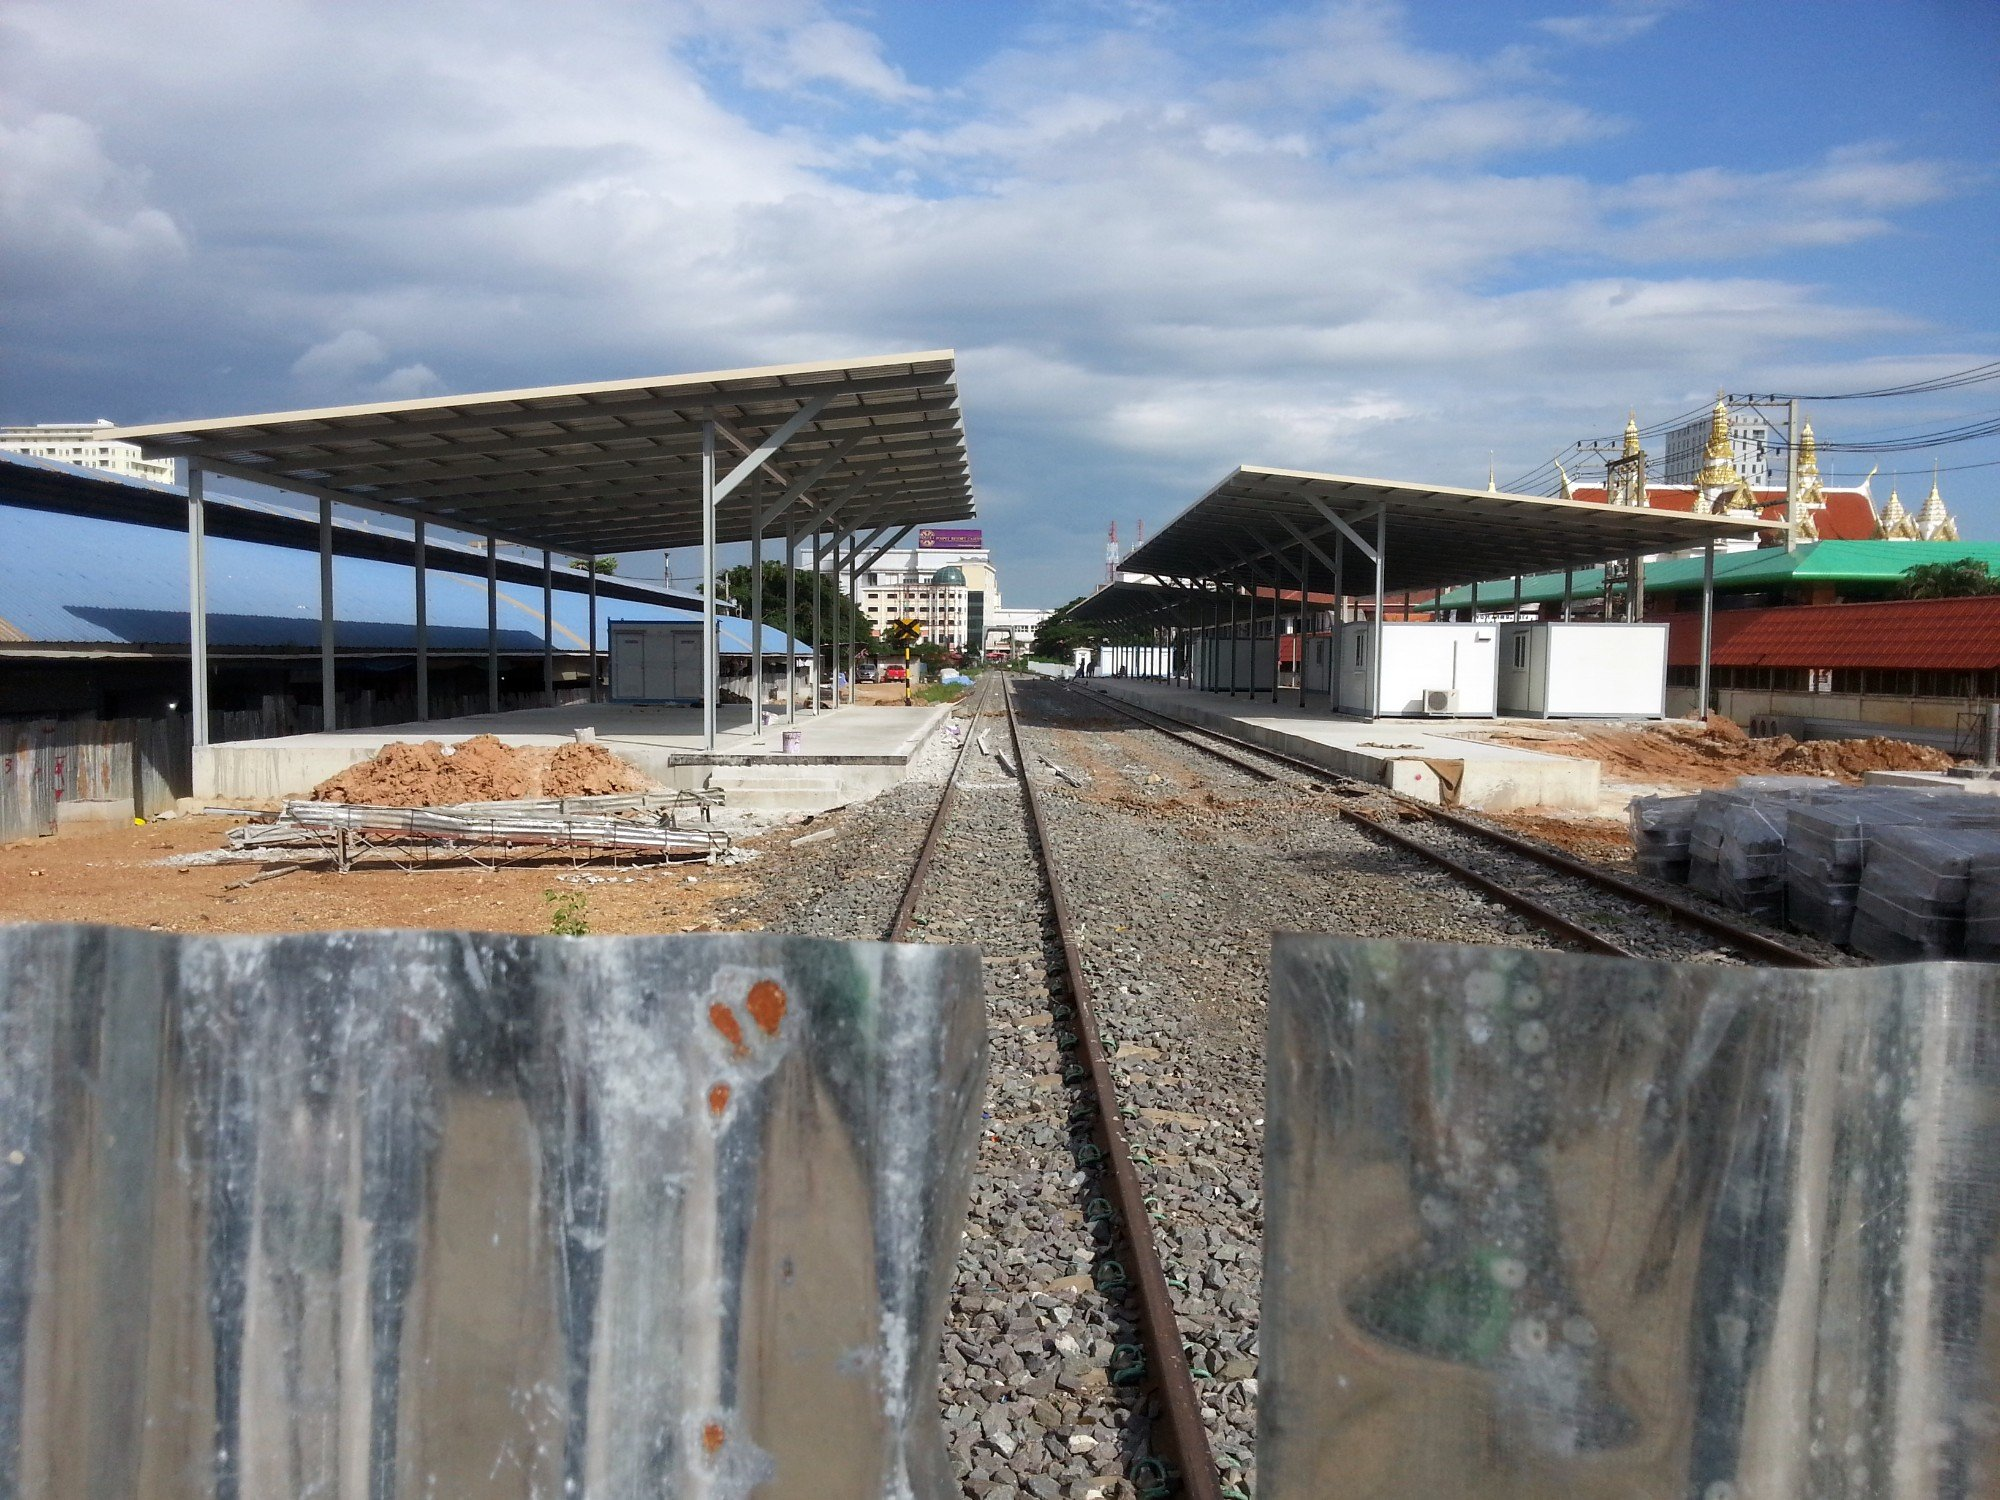 Train station at the Thailand-Cambodia border under construction